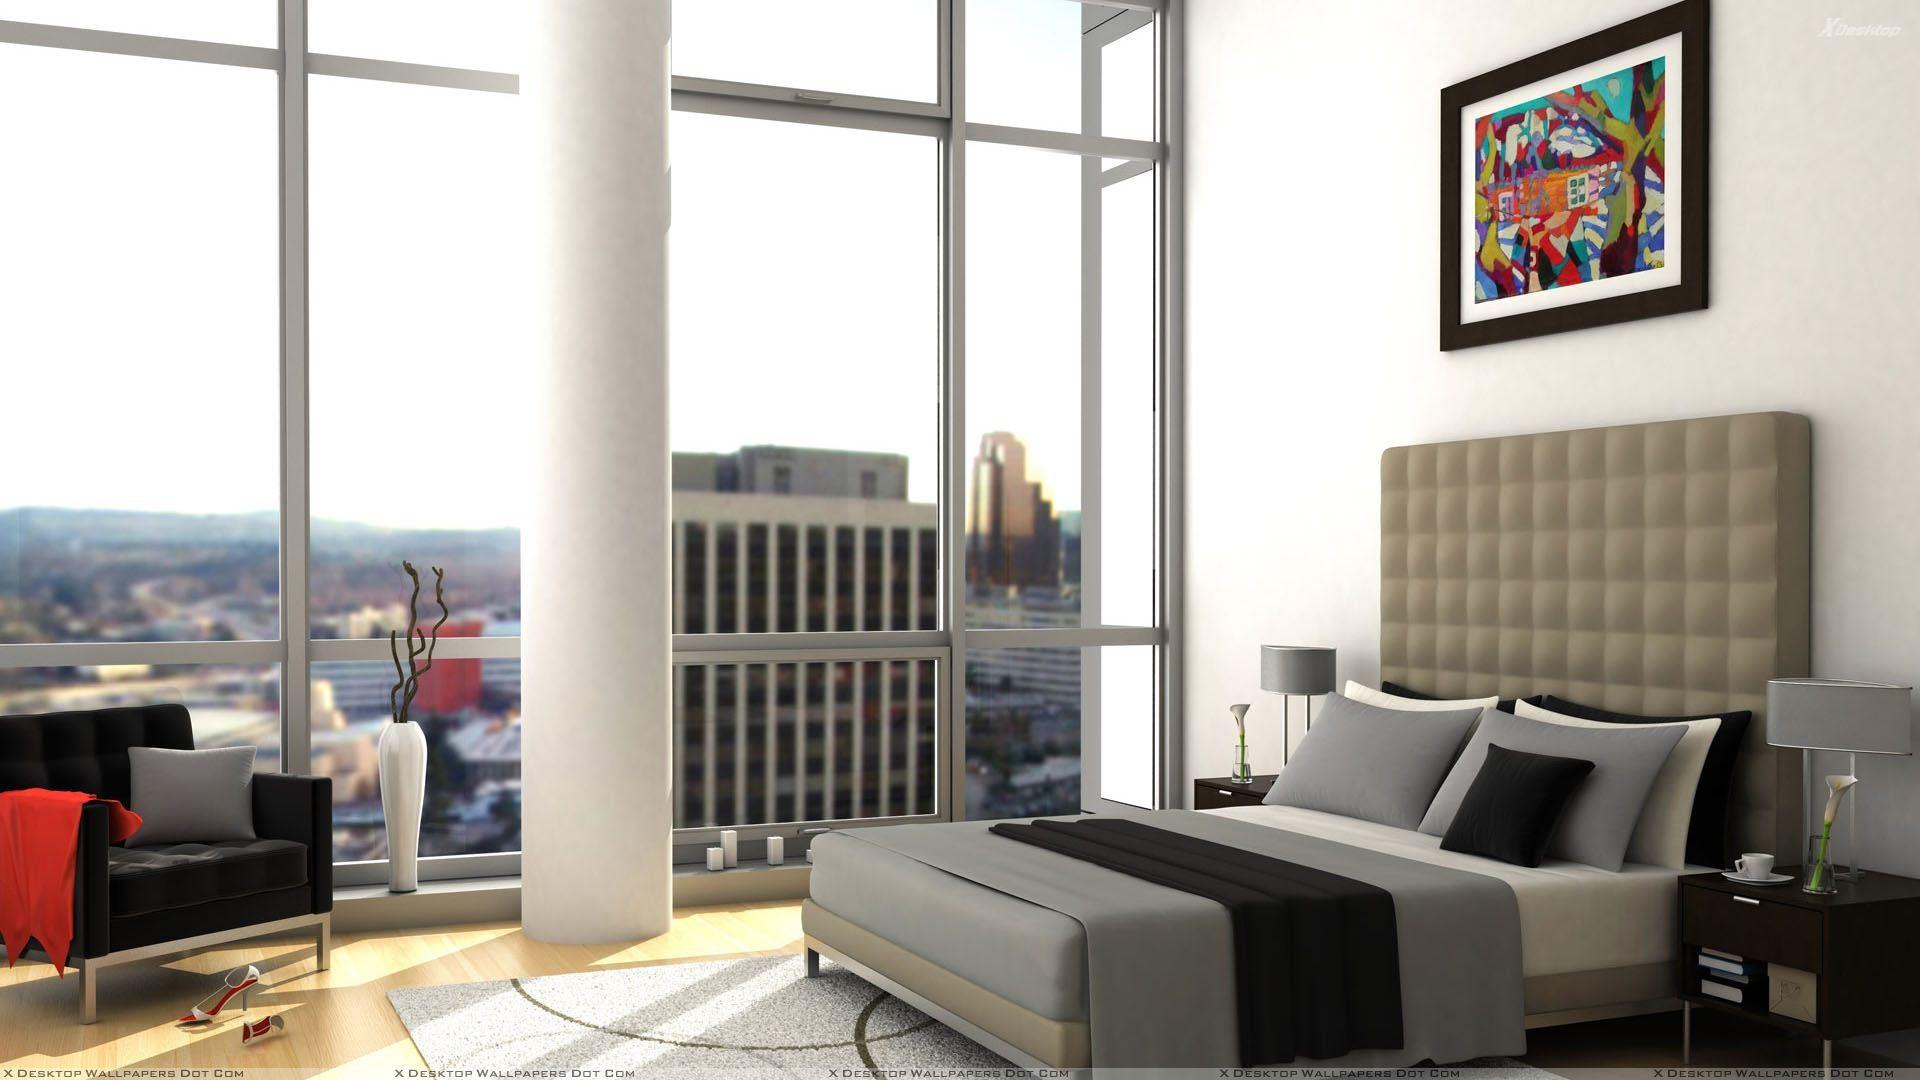 Room Desktop Wallpaper (82+ images)